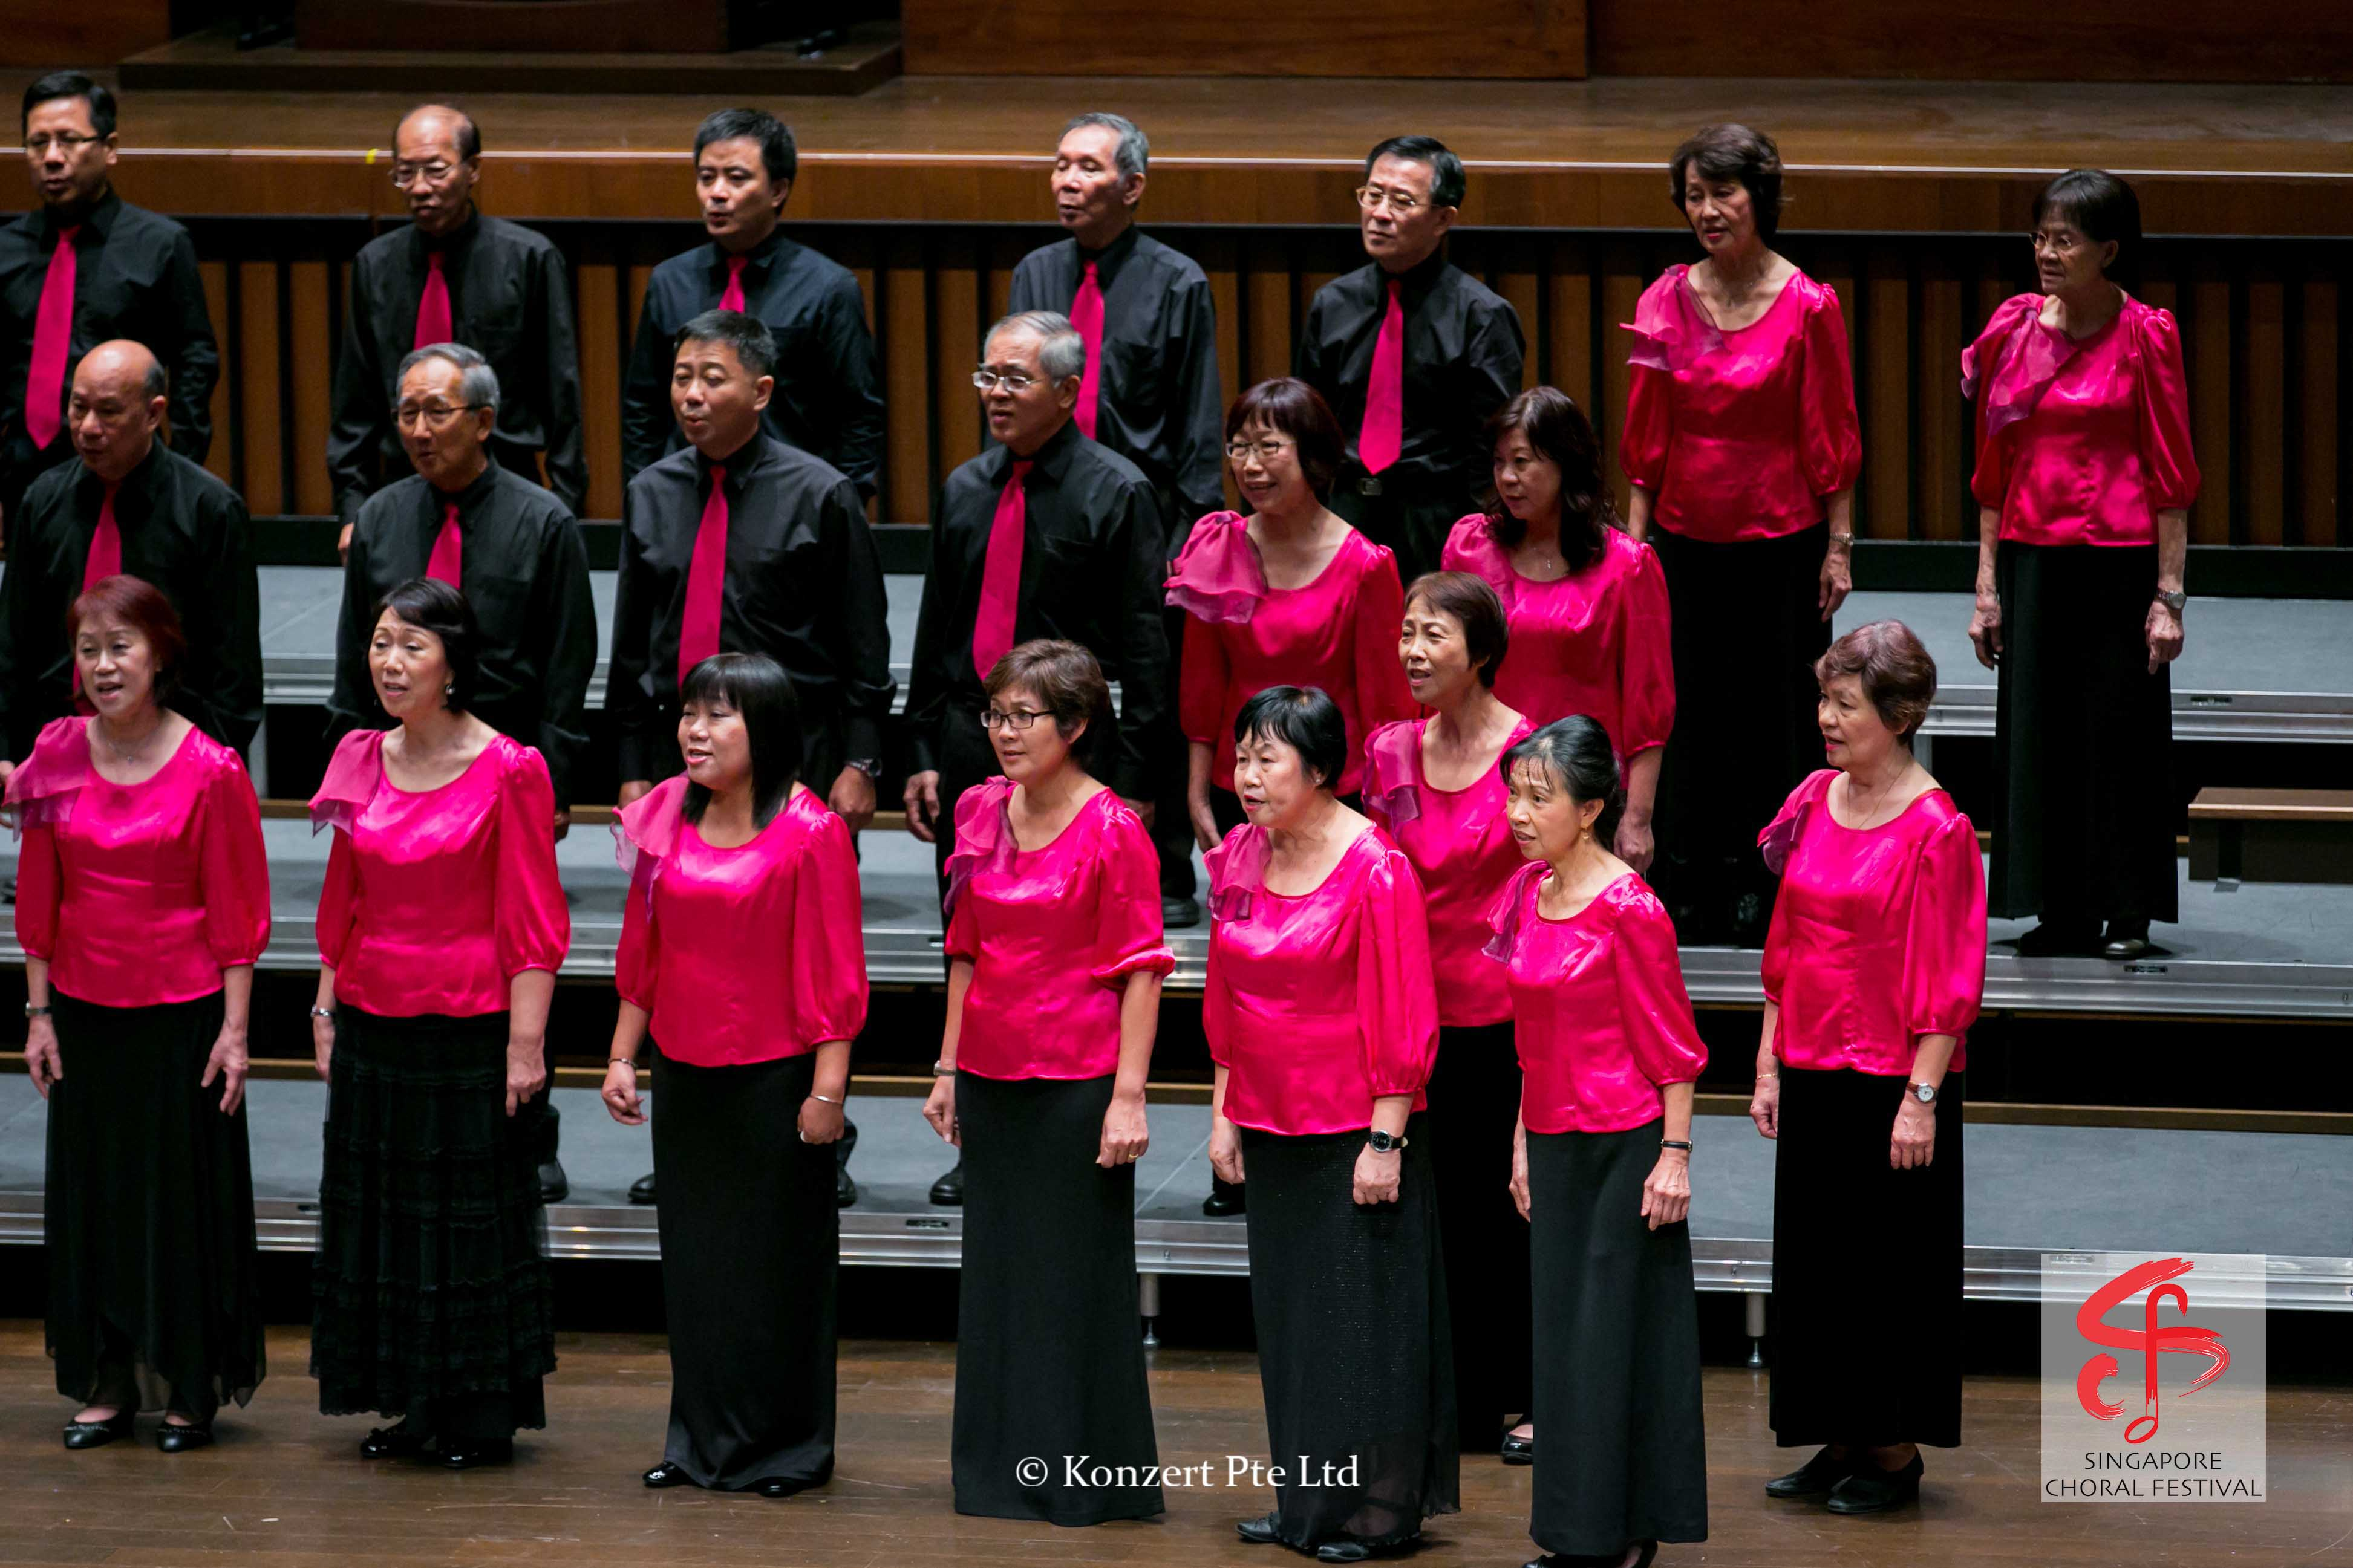 Singapore Choral Festival 7-8-15 (241).jpg